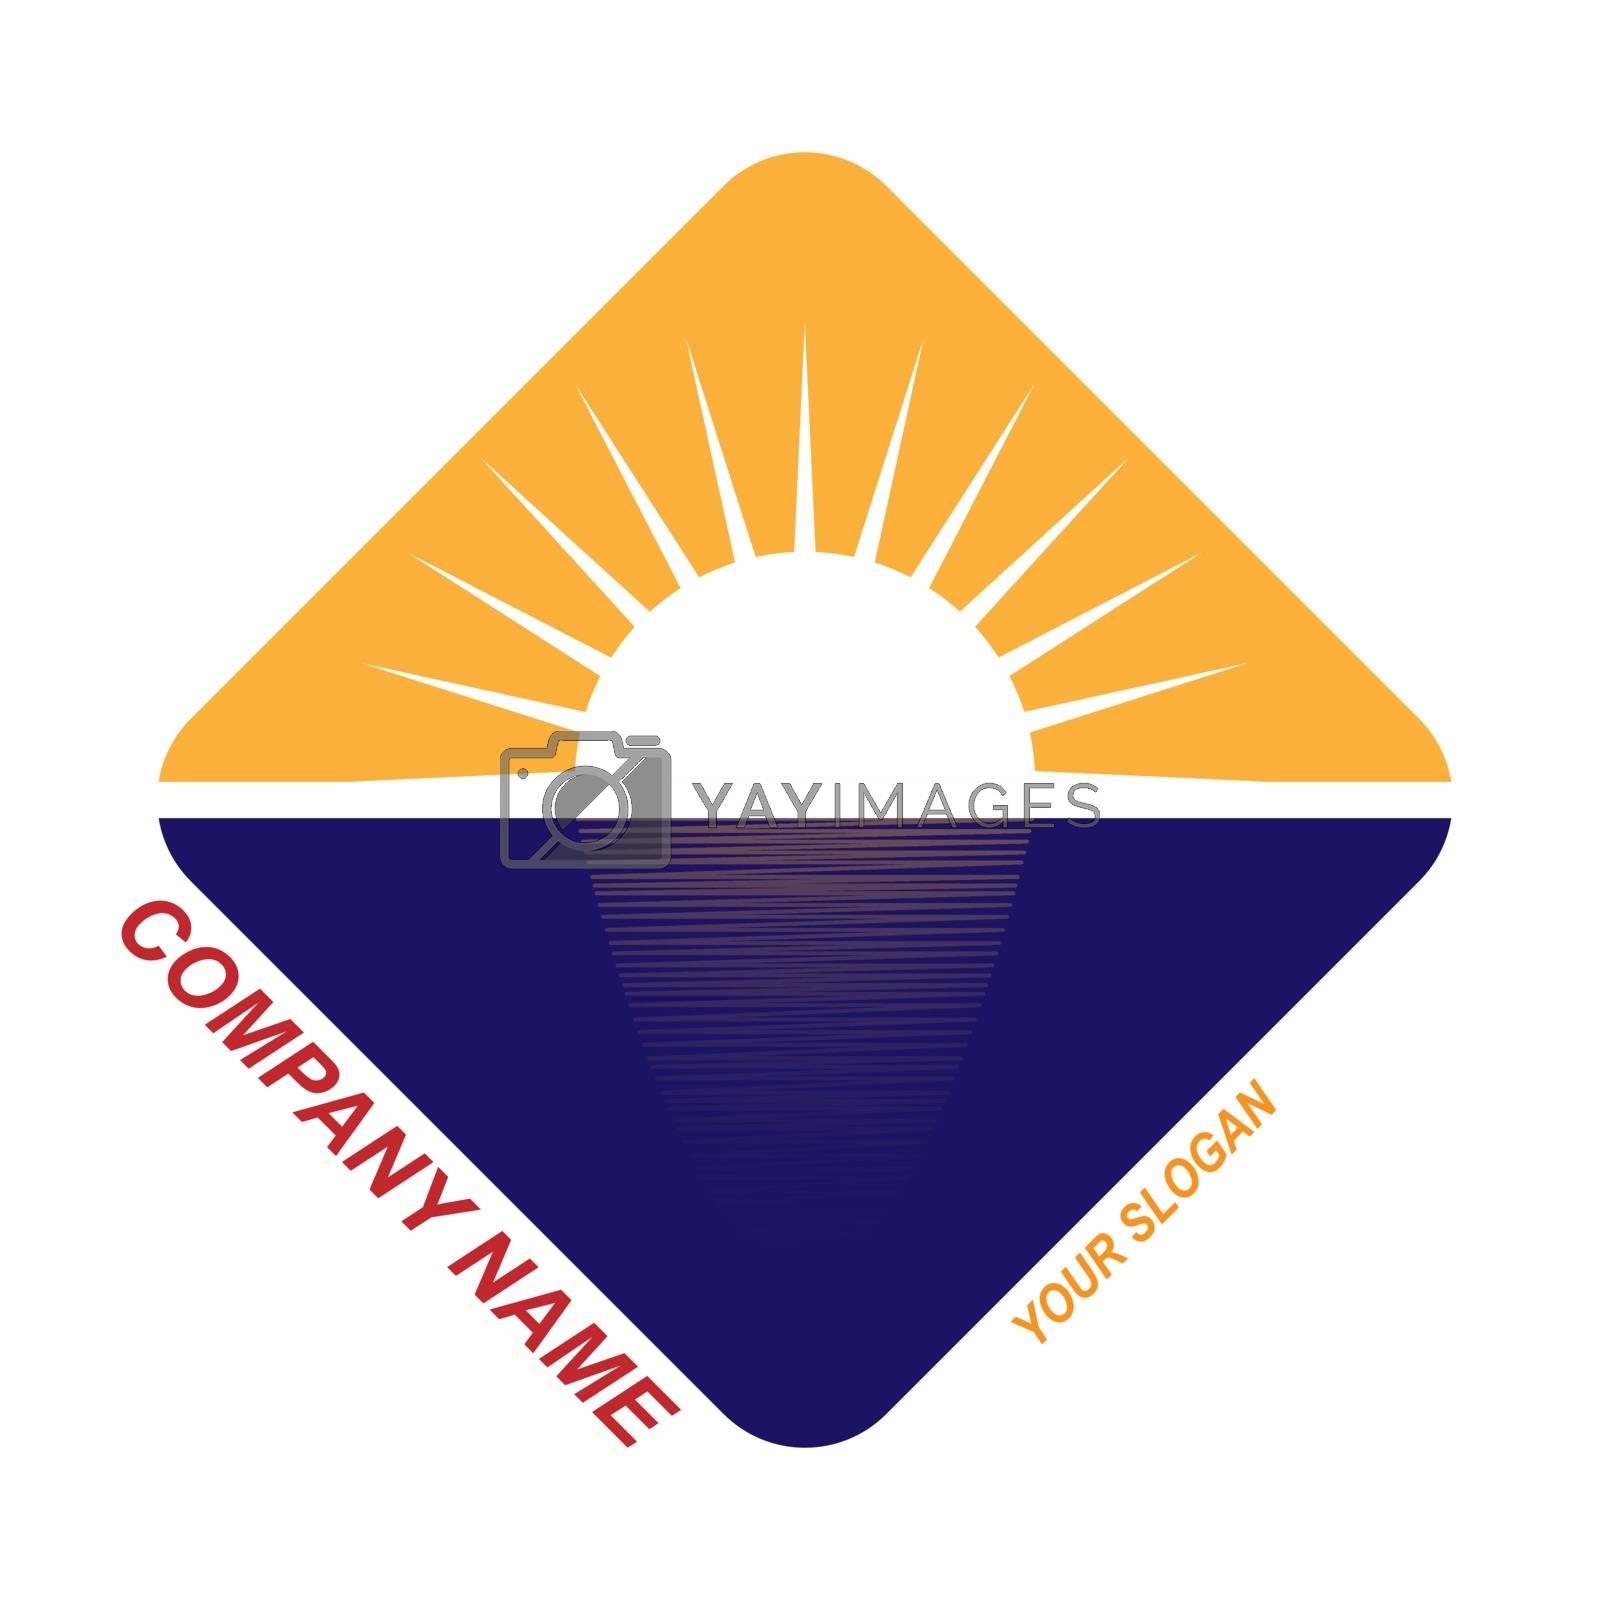 template for travel company logo, travel company, flat design